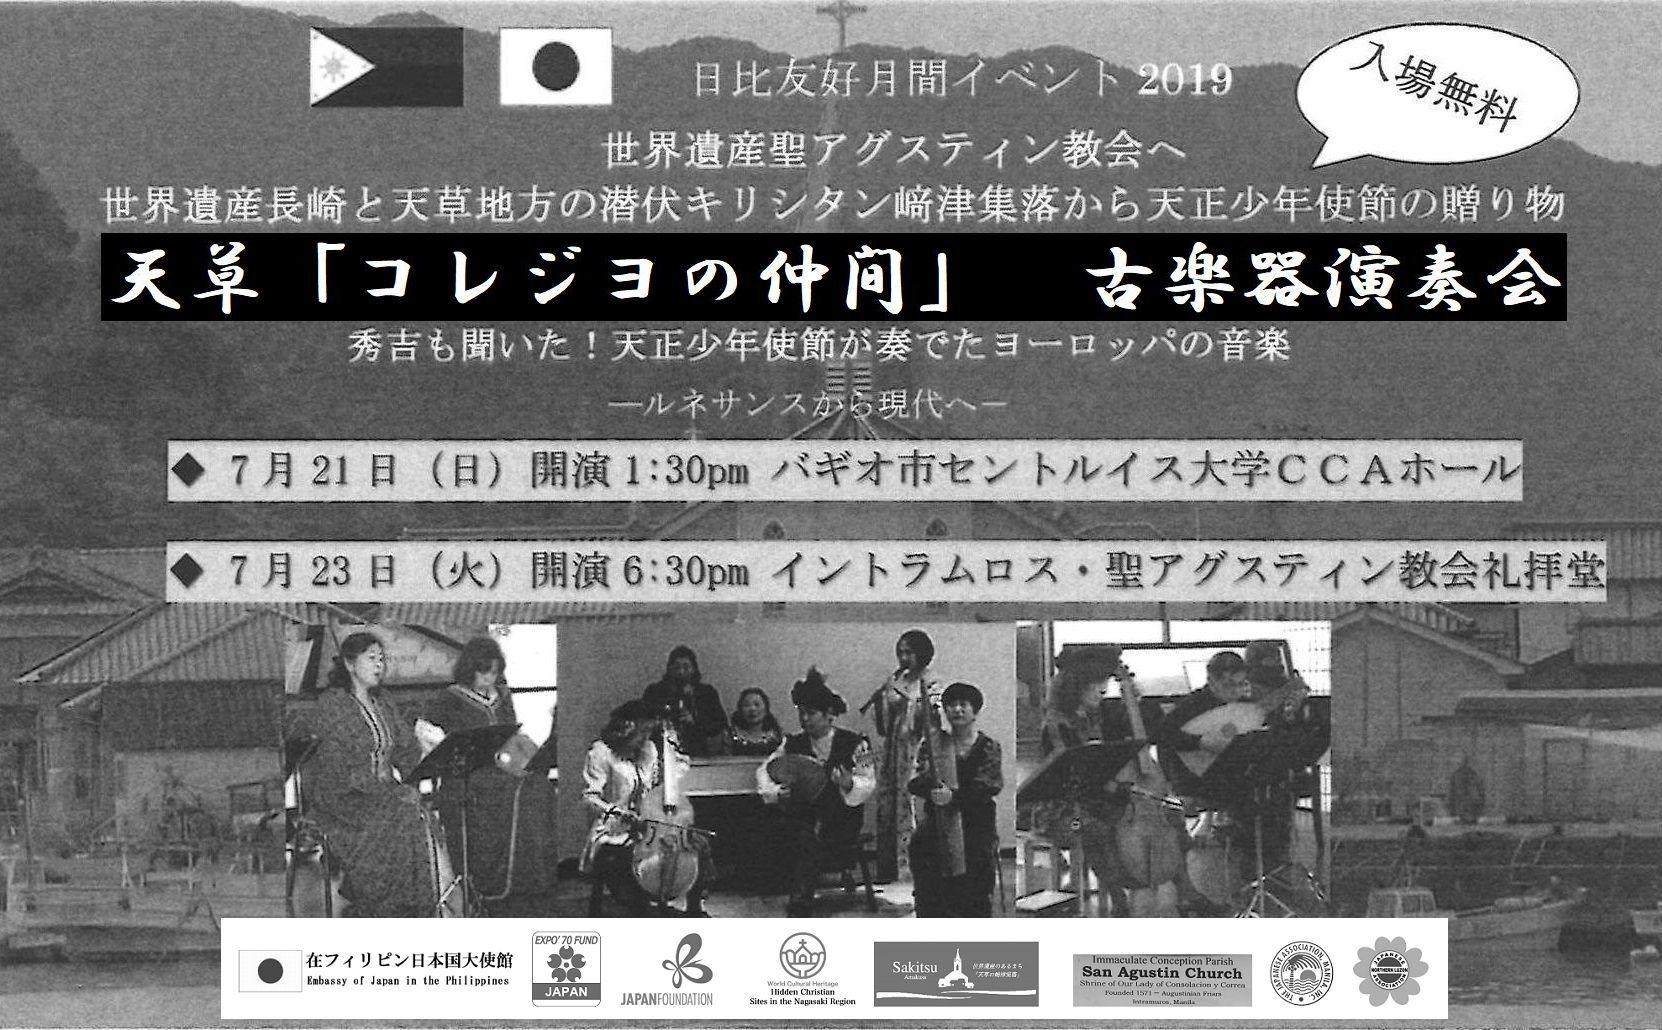 PHILIPPINES-JAPAN FRIENDSHIP month events 2019 BAGUIO TANABATA FESTIVAL 10  日比友好月間イベント バギオ市_a0109542_12134356.jpg